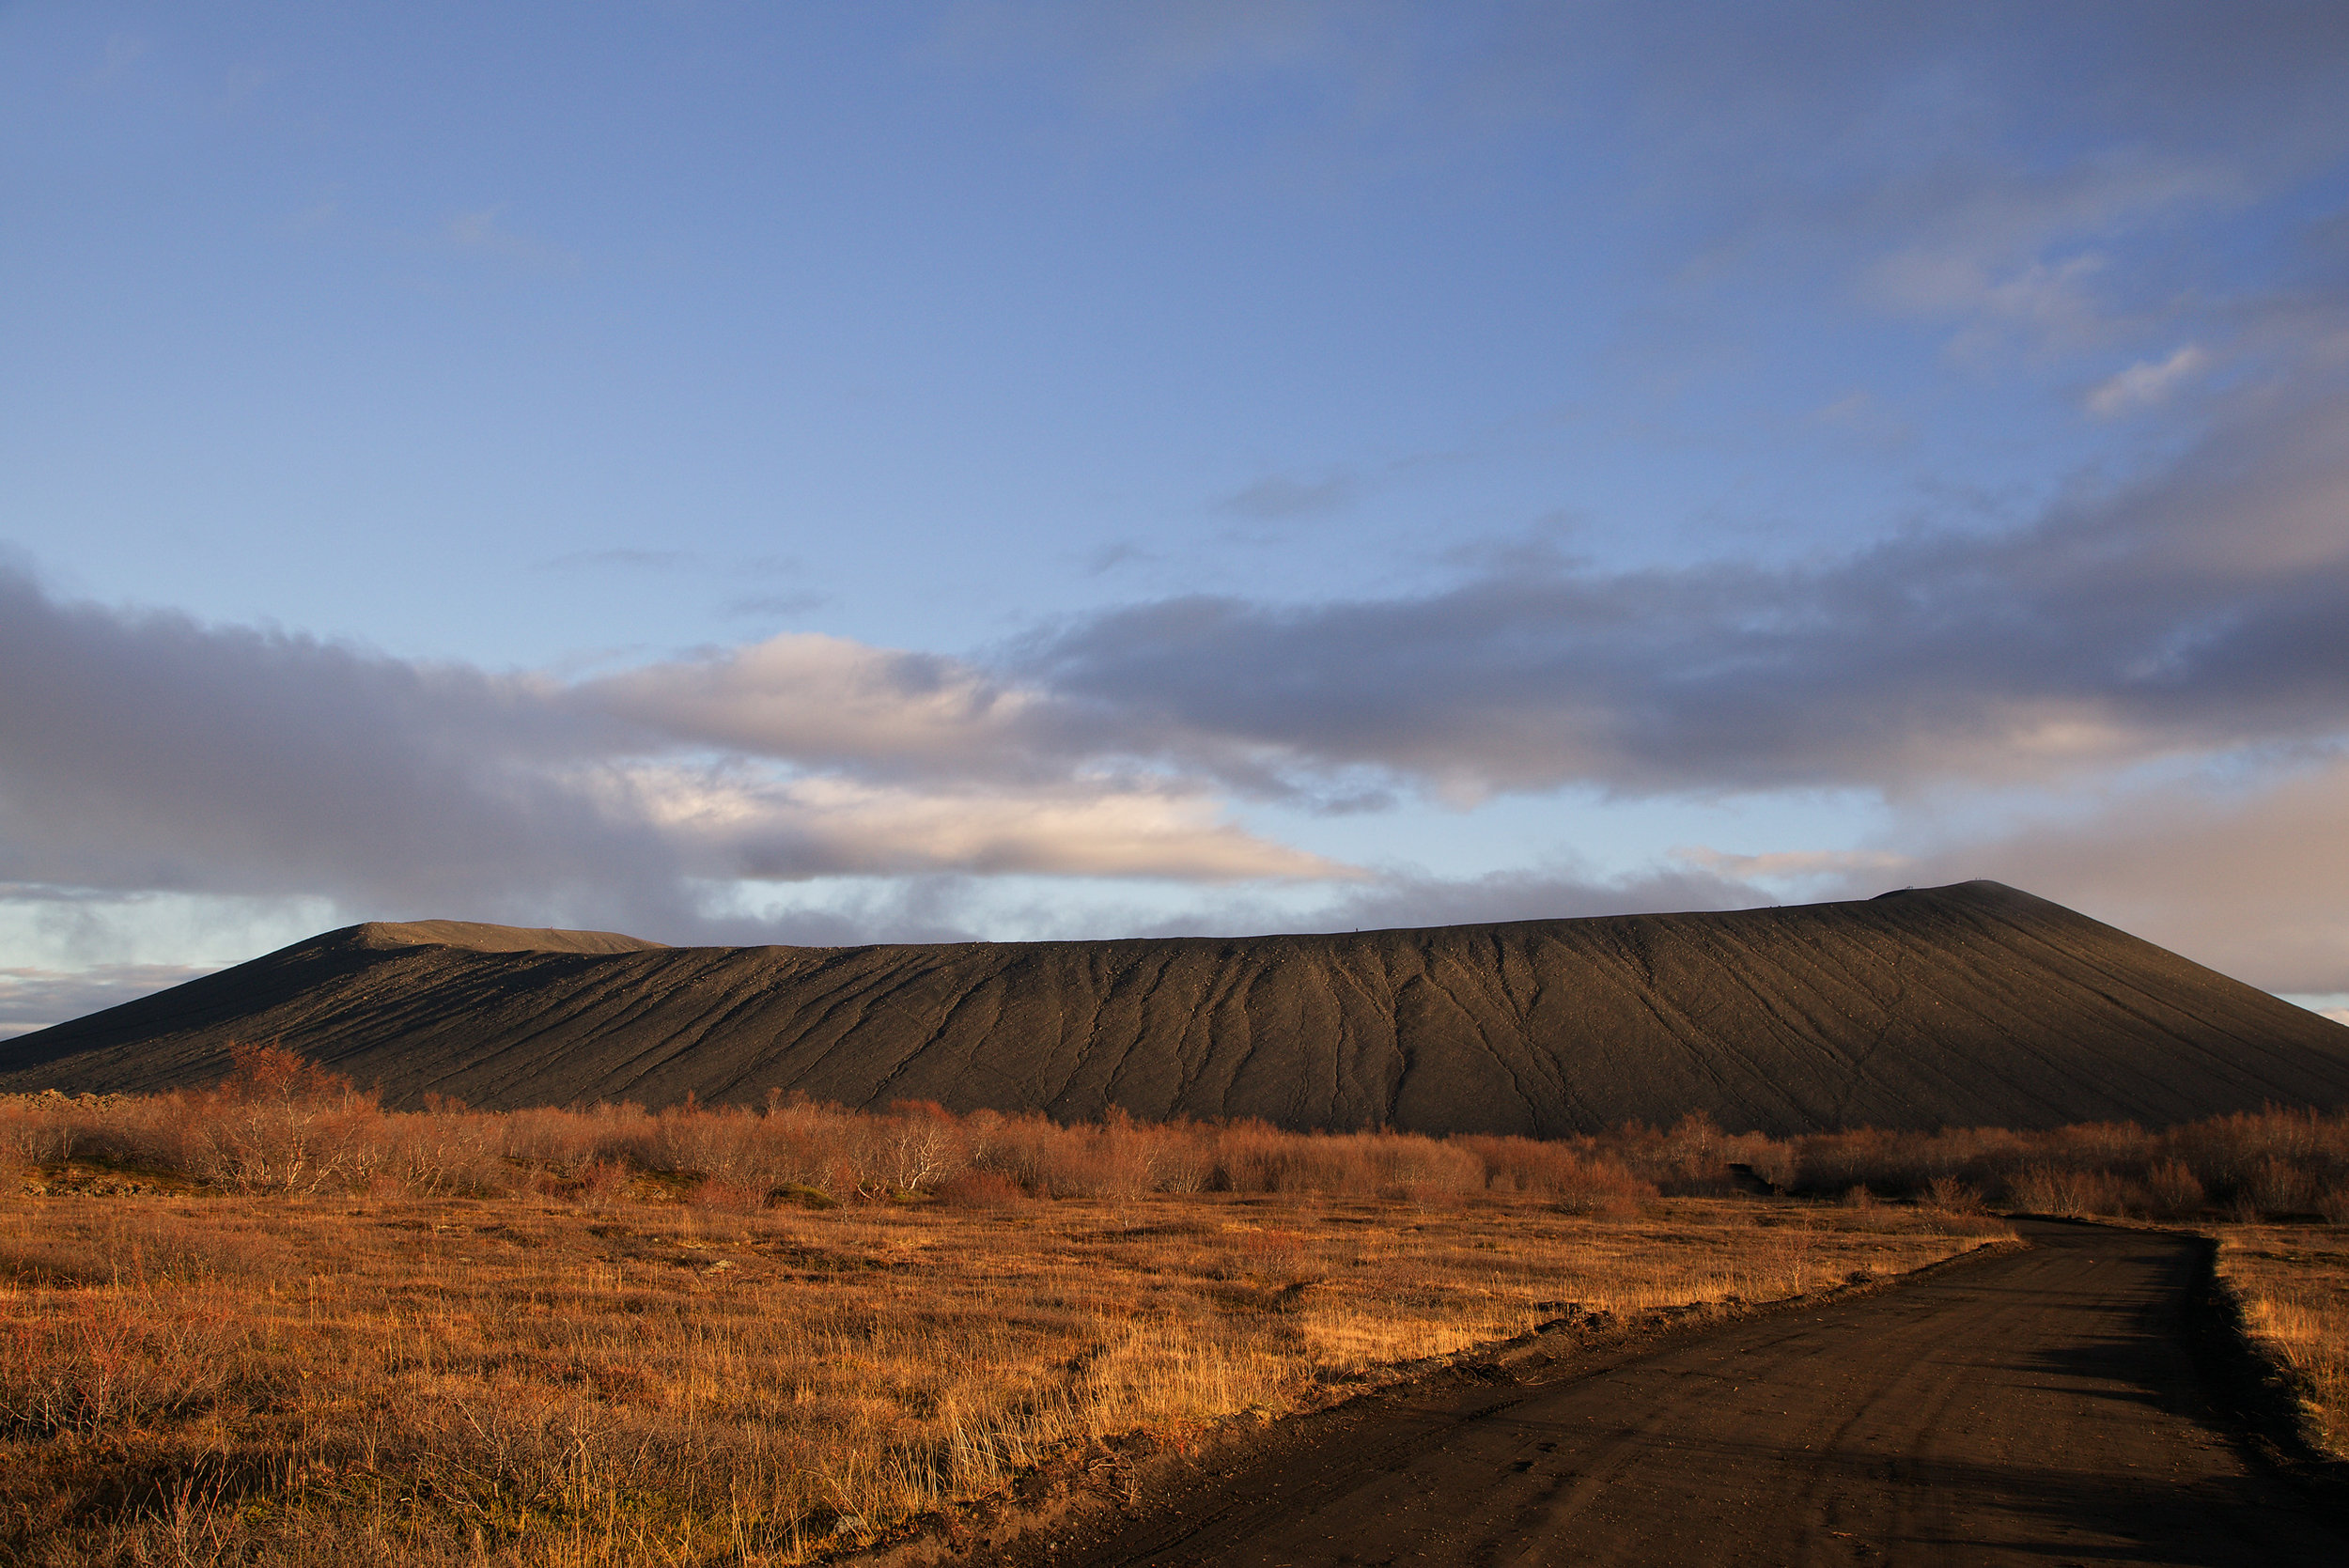 Iceland_Volcano_Big_Crater.jpg